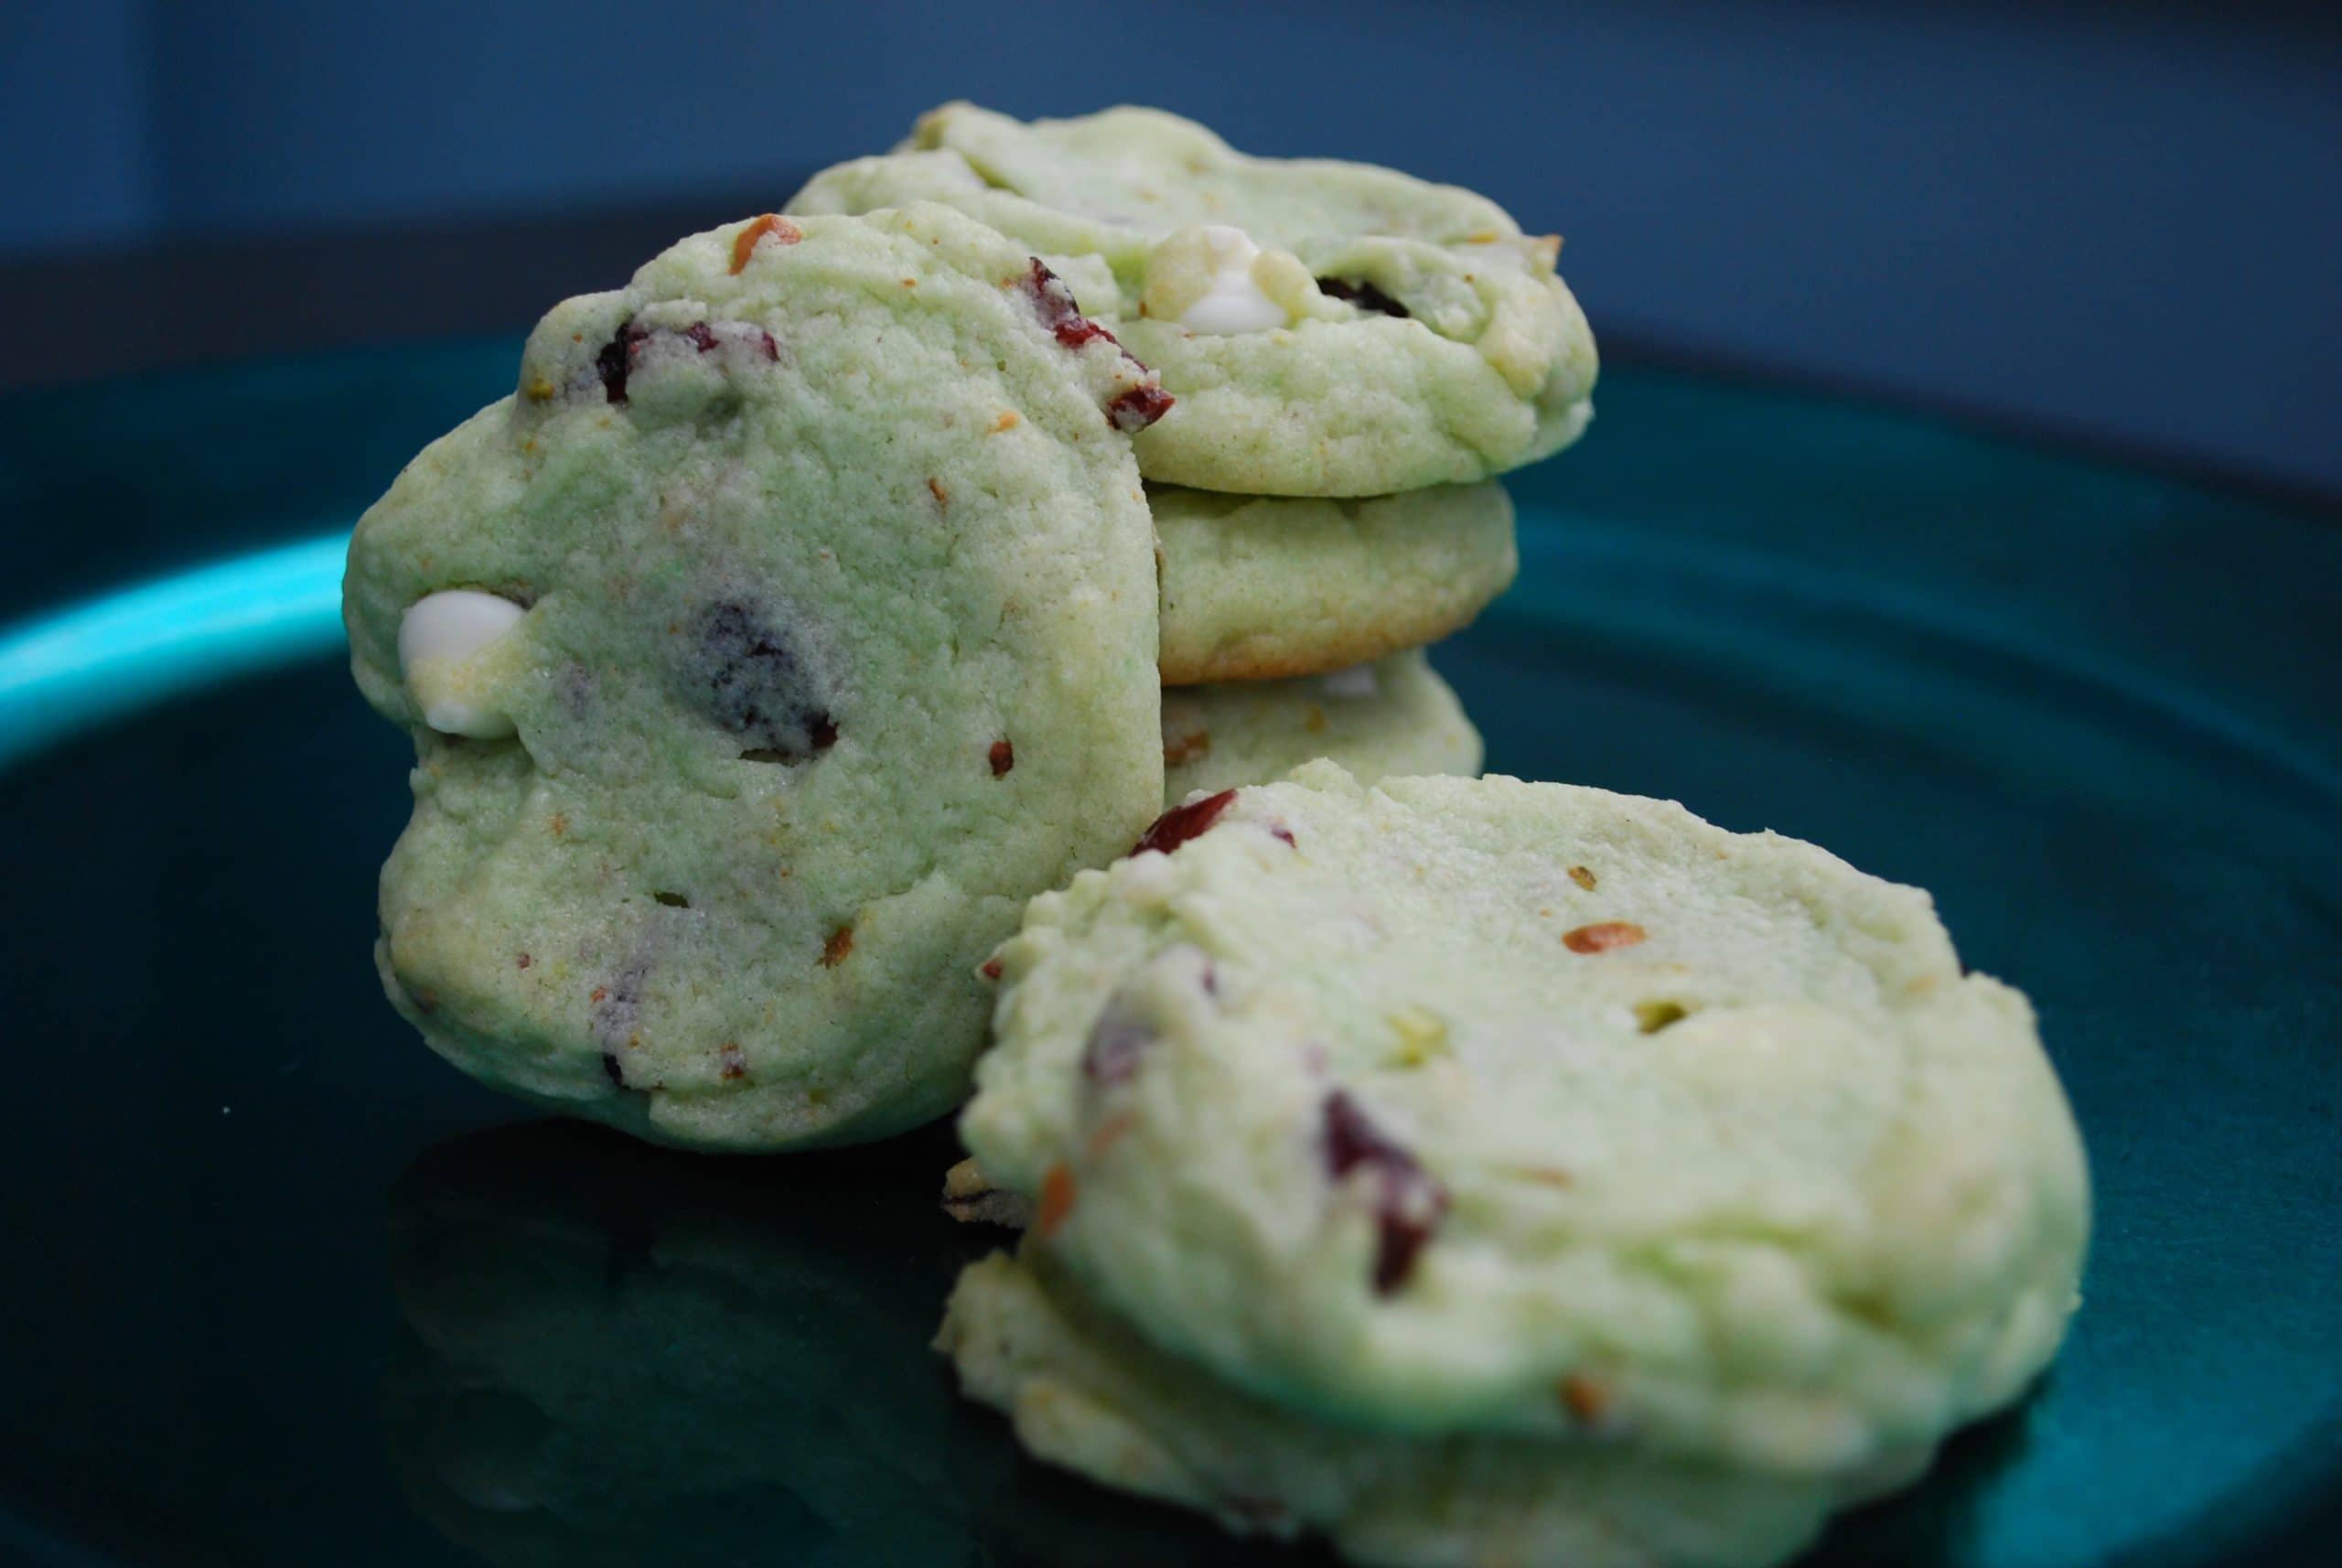 Cranberry Pistachio White Chocolate Chip Cookies - A Dash of Megnut